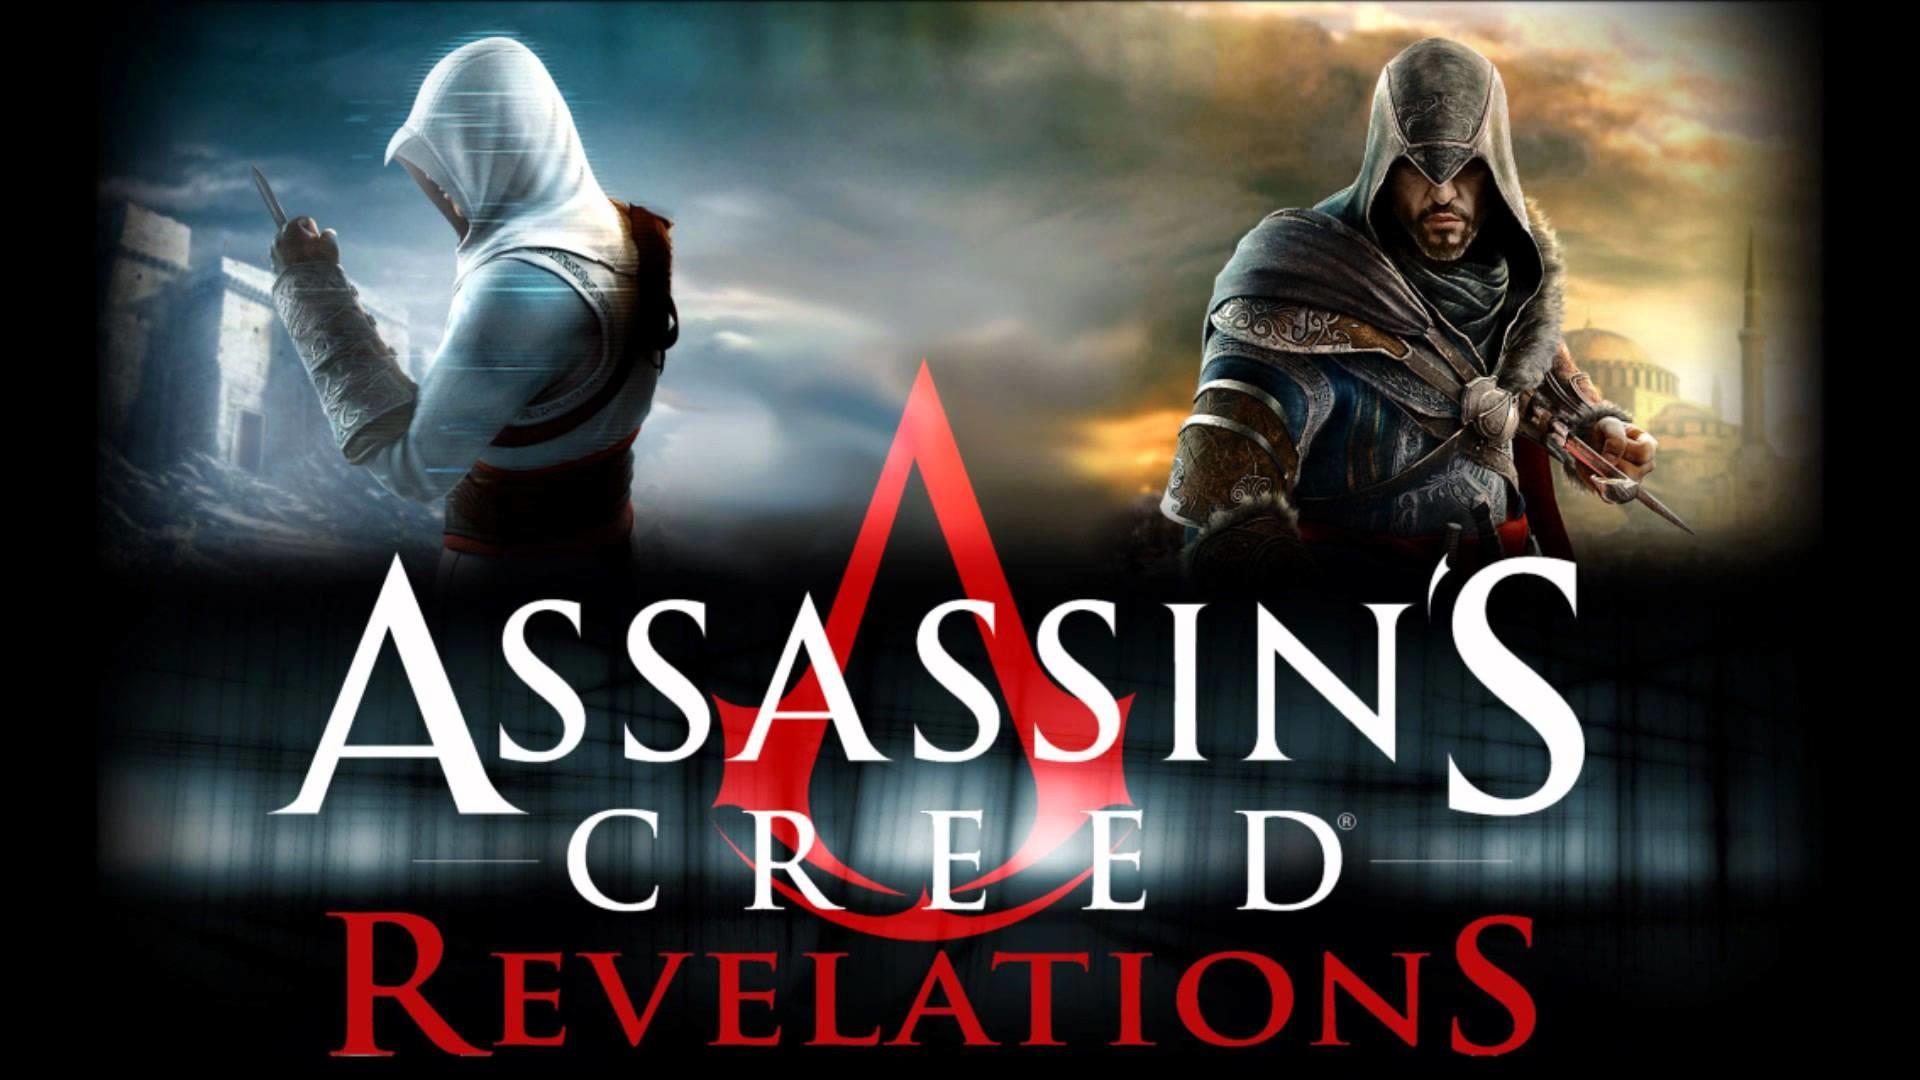 Assassin's Creed Revelations Soundtracks – 2 – 17 Investigation HD – YouTube